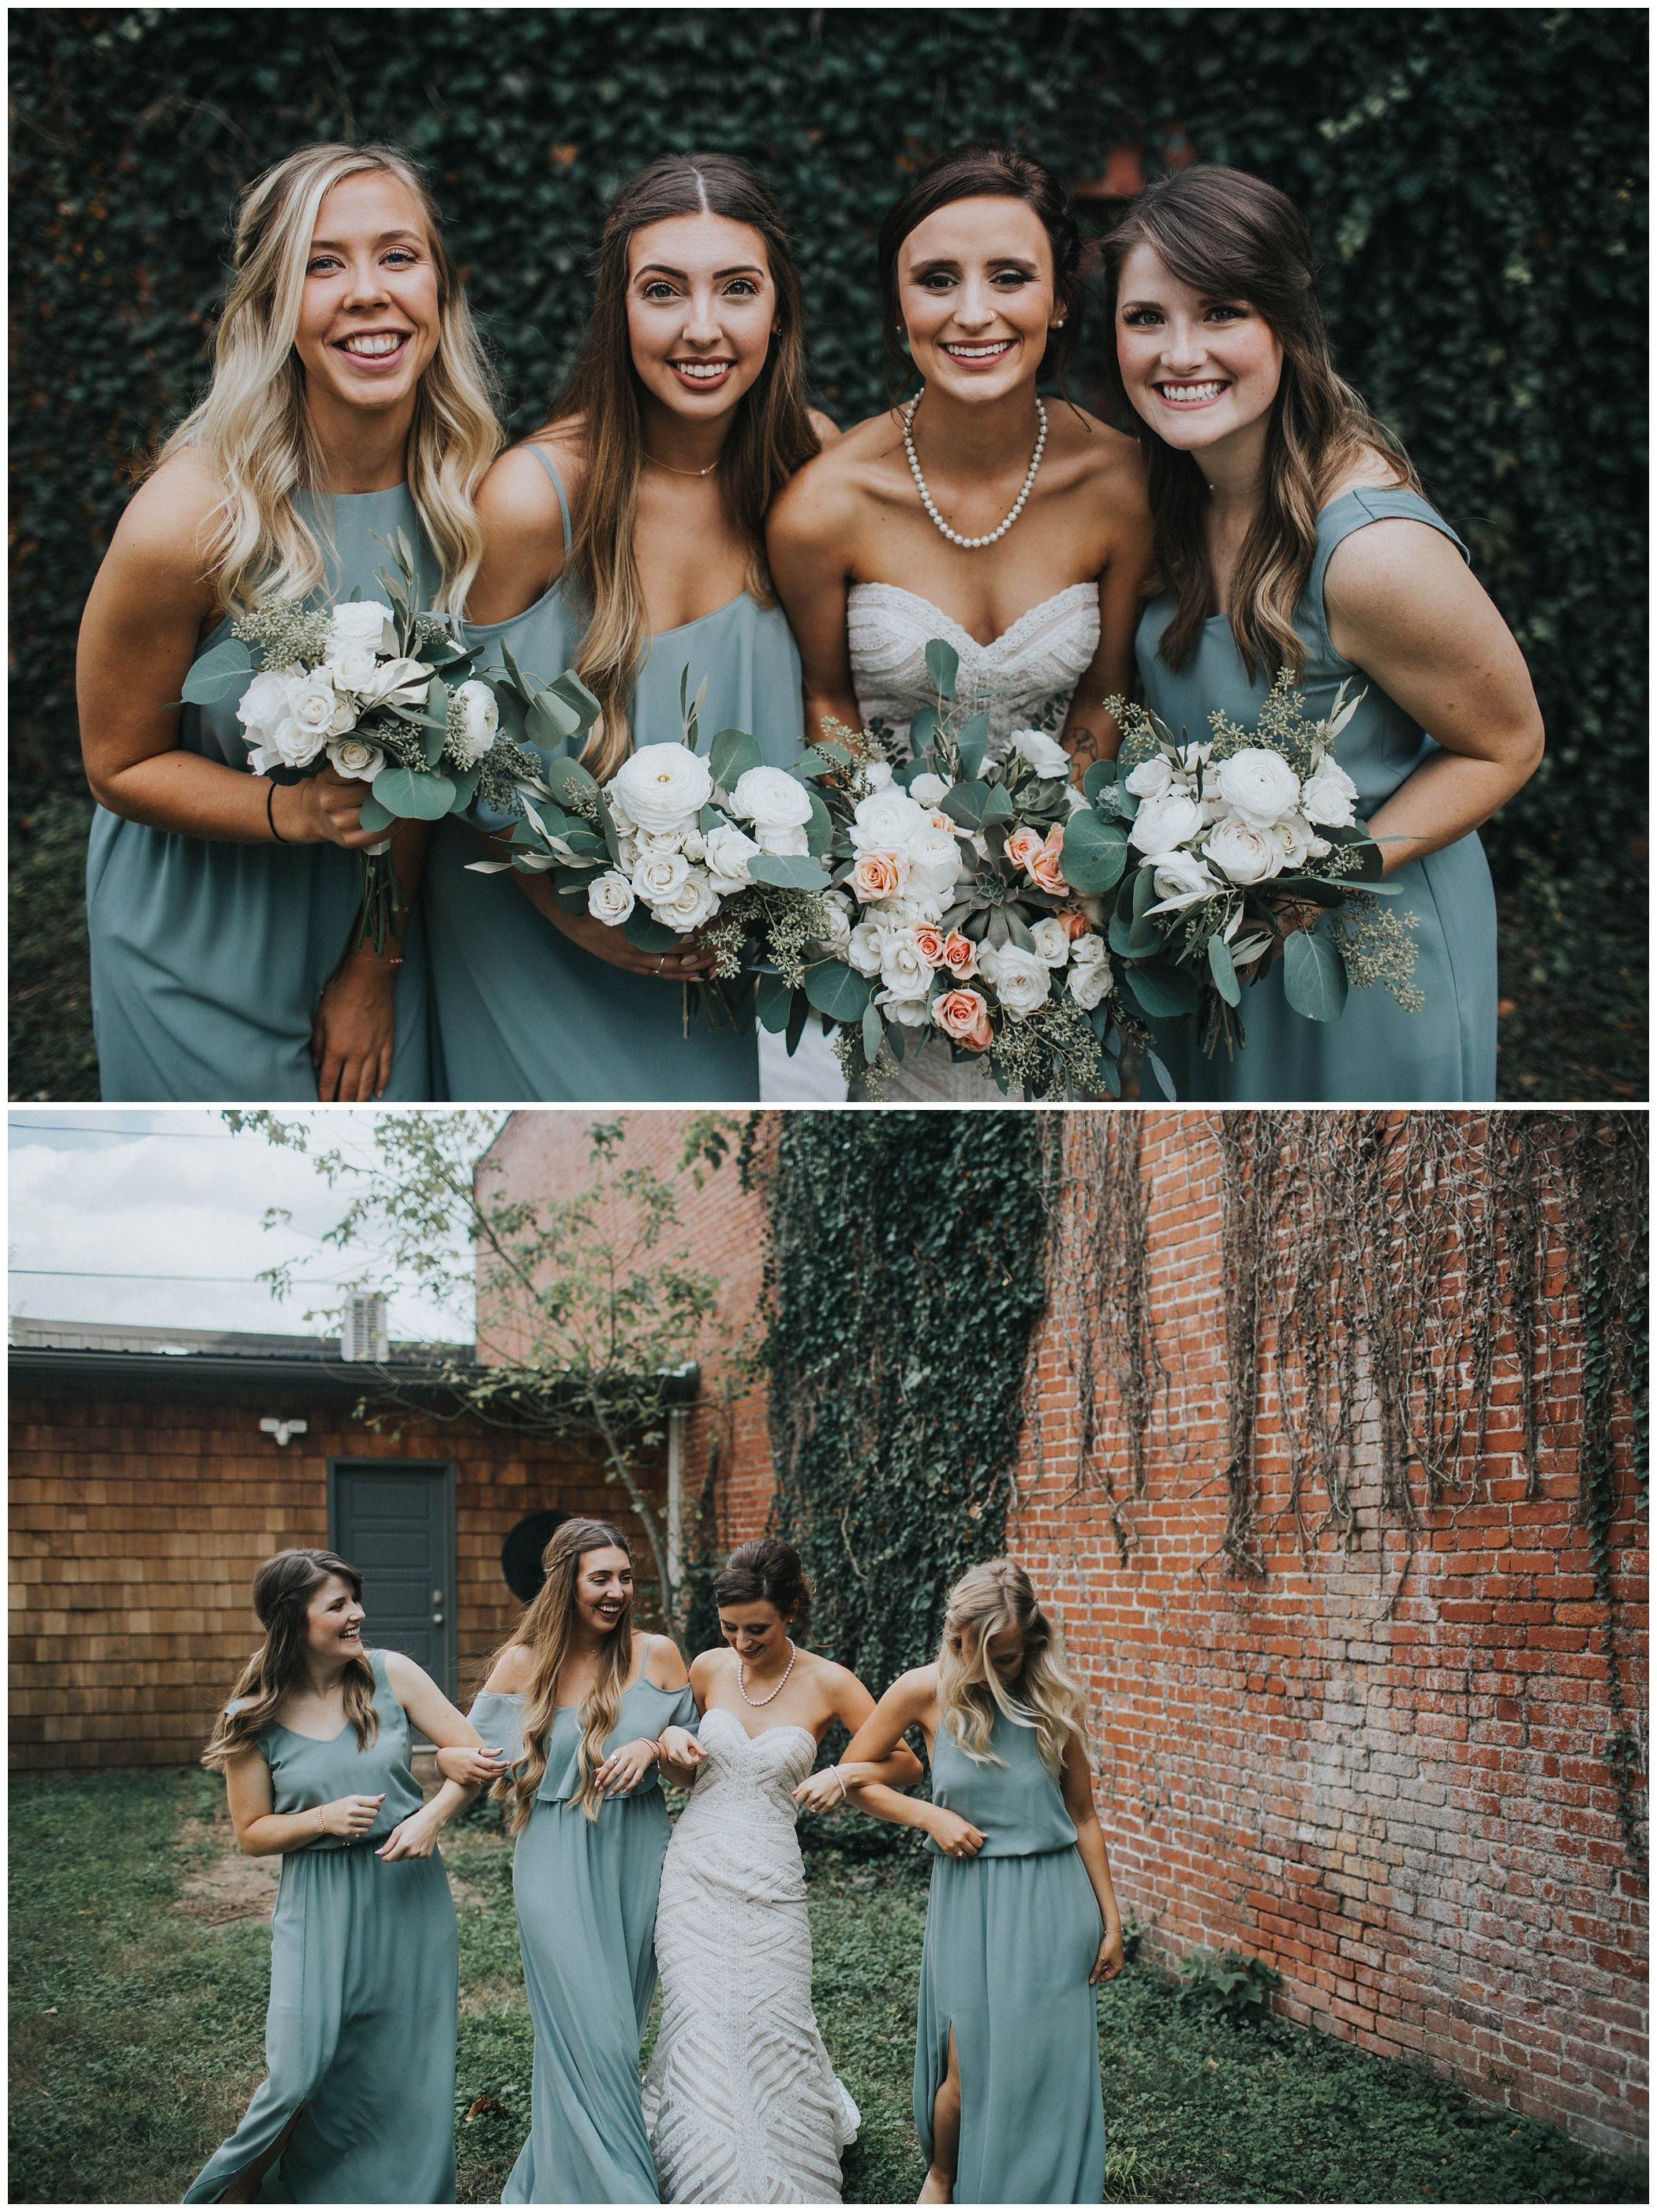 Sage Green Mismatched Bridesmaids Dresses Wedding Inspiration By The Johnsons Wedding Photogra Sage Bridesmaid Dresses Wedding Photography Bridesmaid Dresses